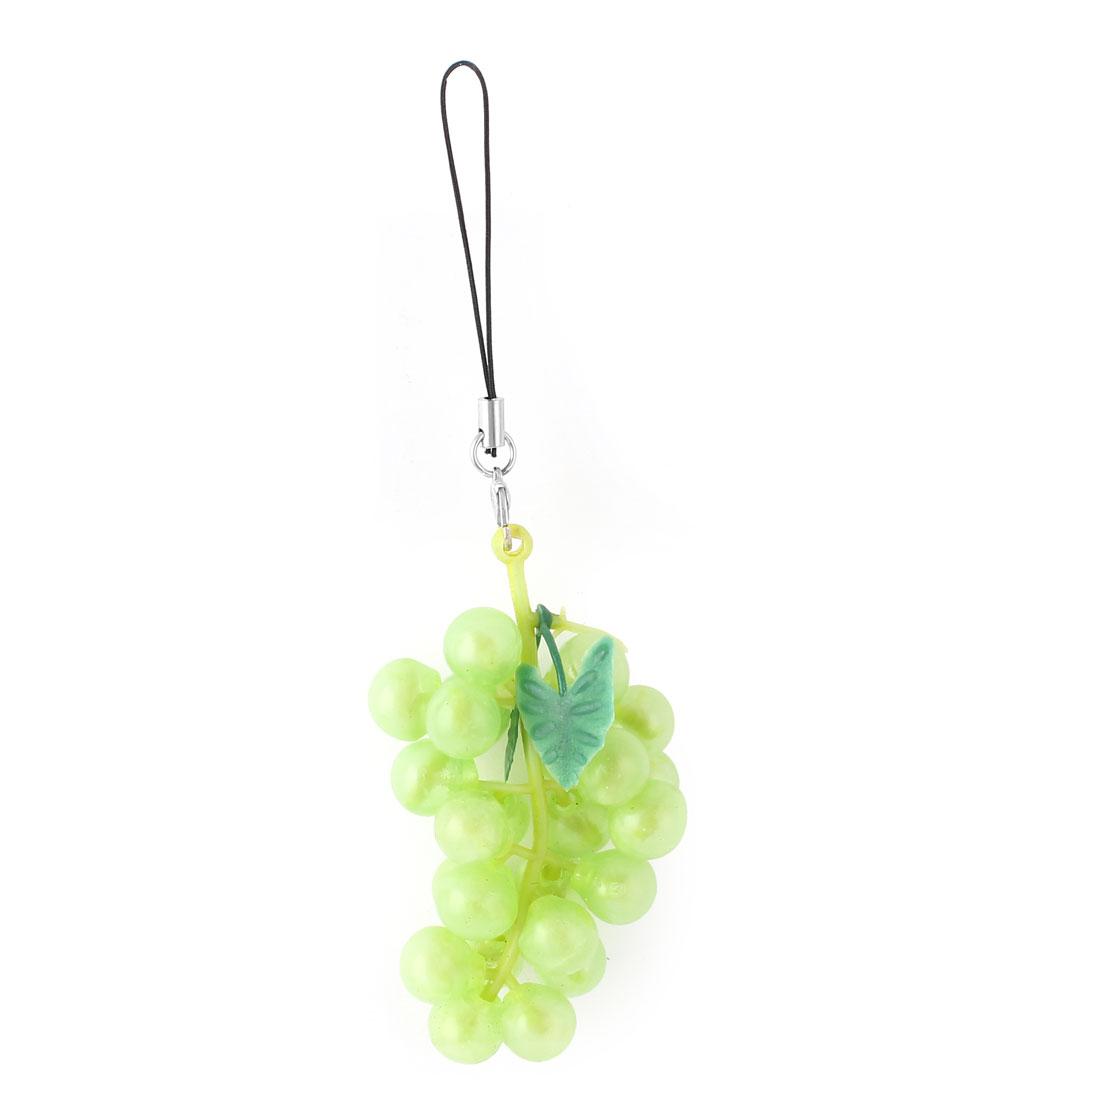 Simulation Green Grapes Shaped Pendant Strap Cellphone Purse Handbag Decor